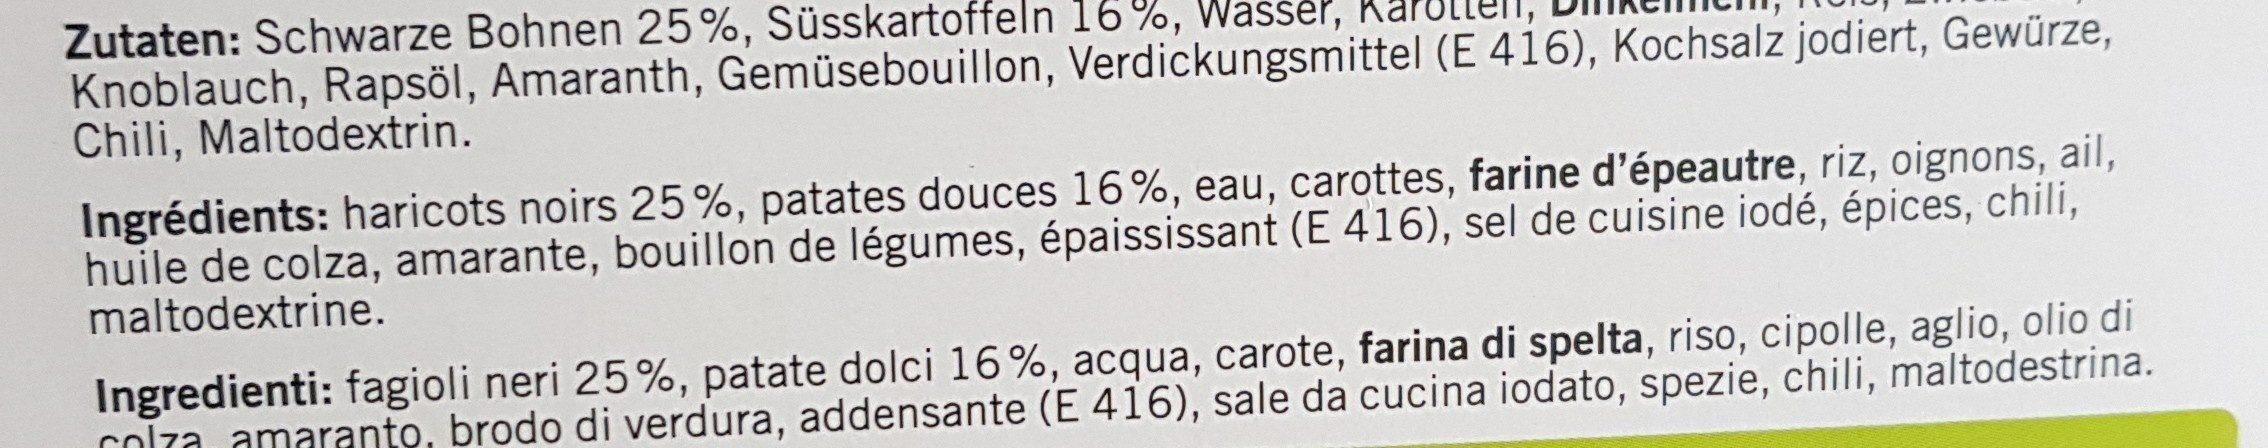 Black Bean Burger - Ingredients